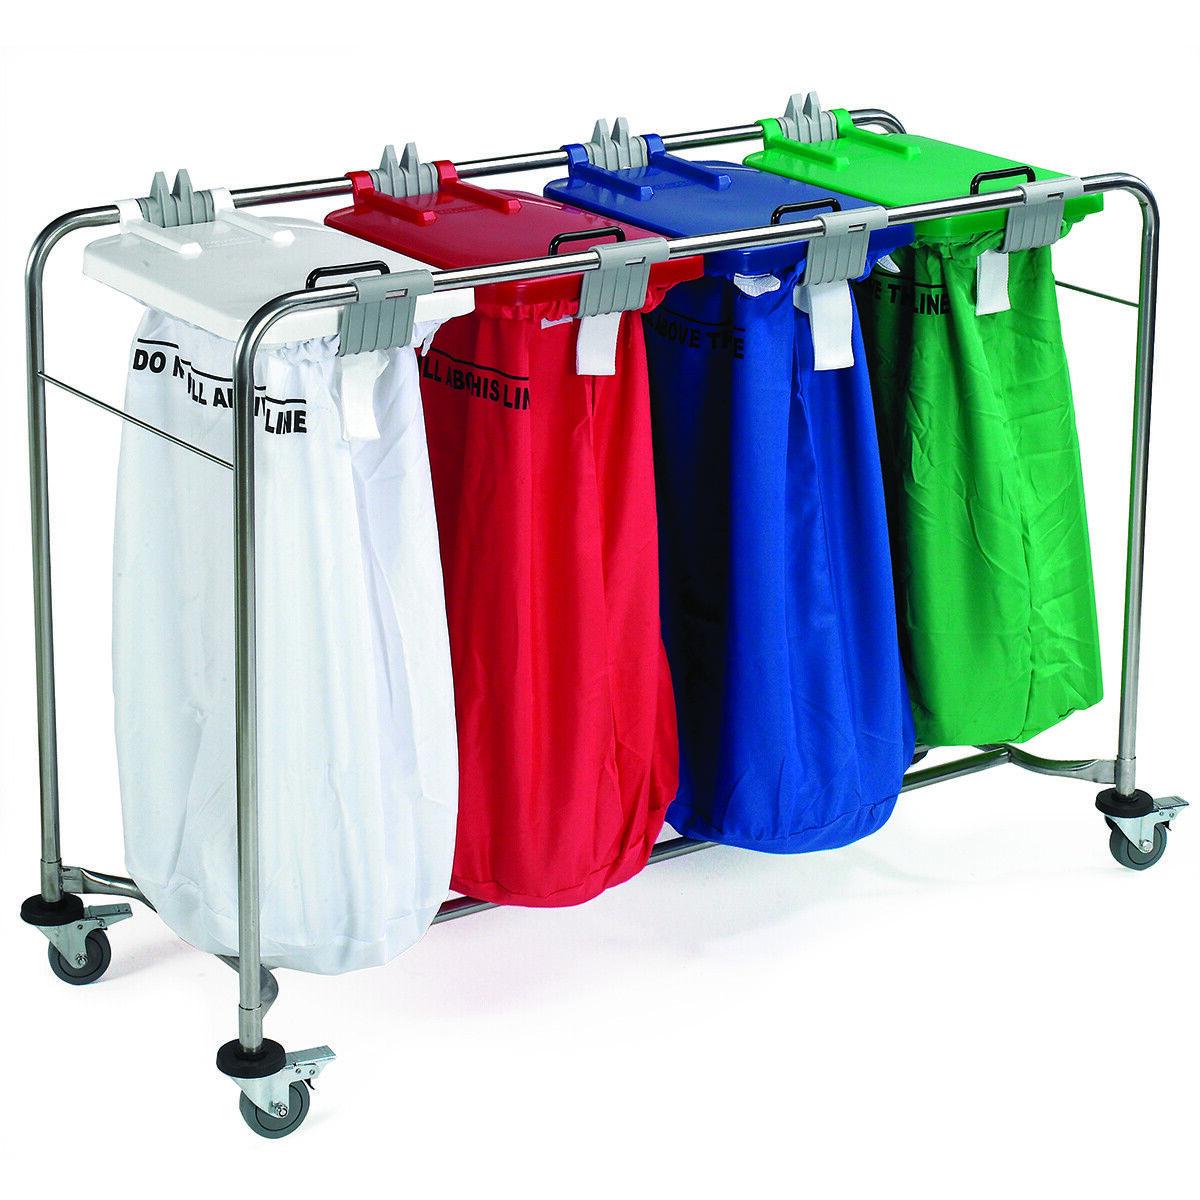 Medi Cart Laundry Trolley - 4 Bag